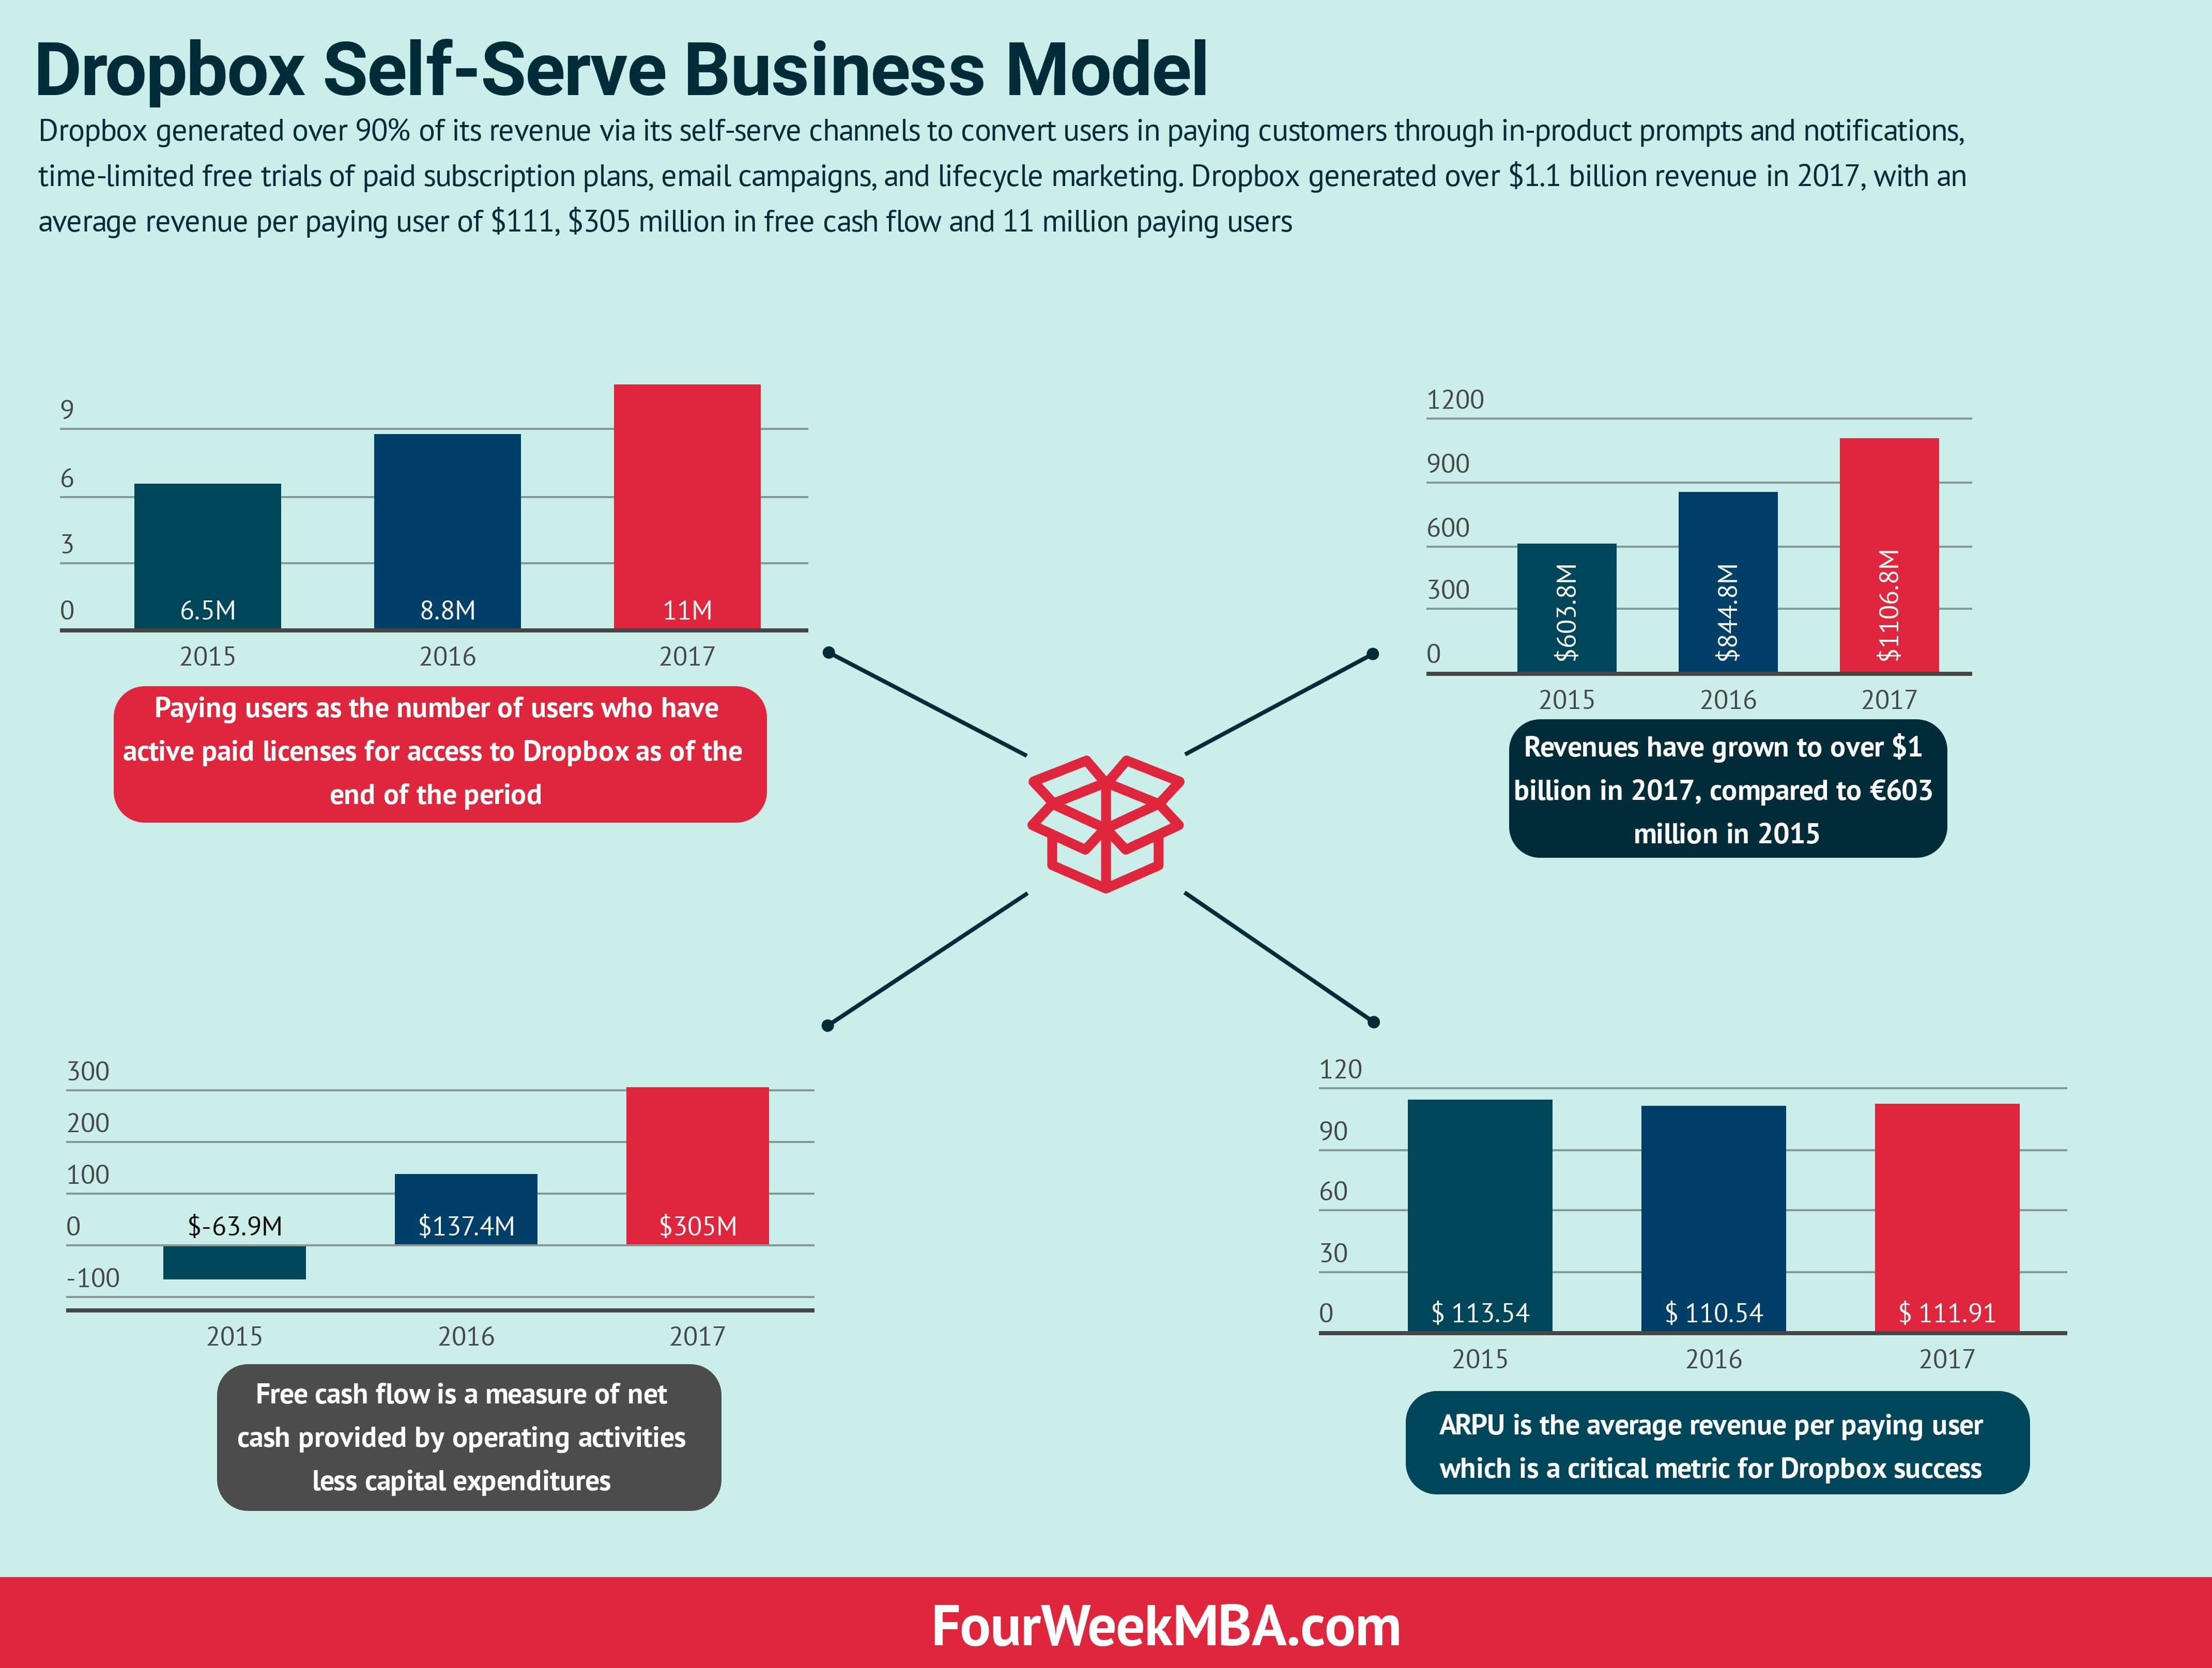 Cash Flows Via Multiple Channels To >> Dropbox Self Serve Business Model In A Nutshell Fourweekmba